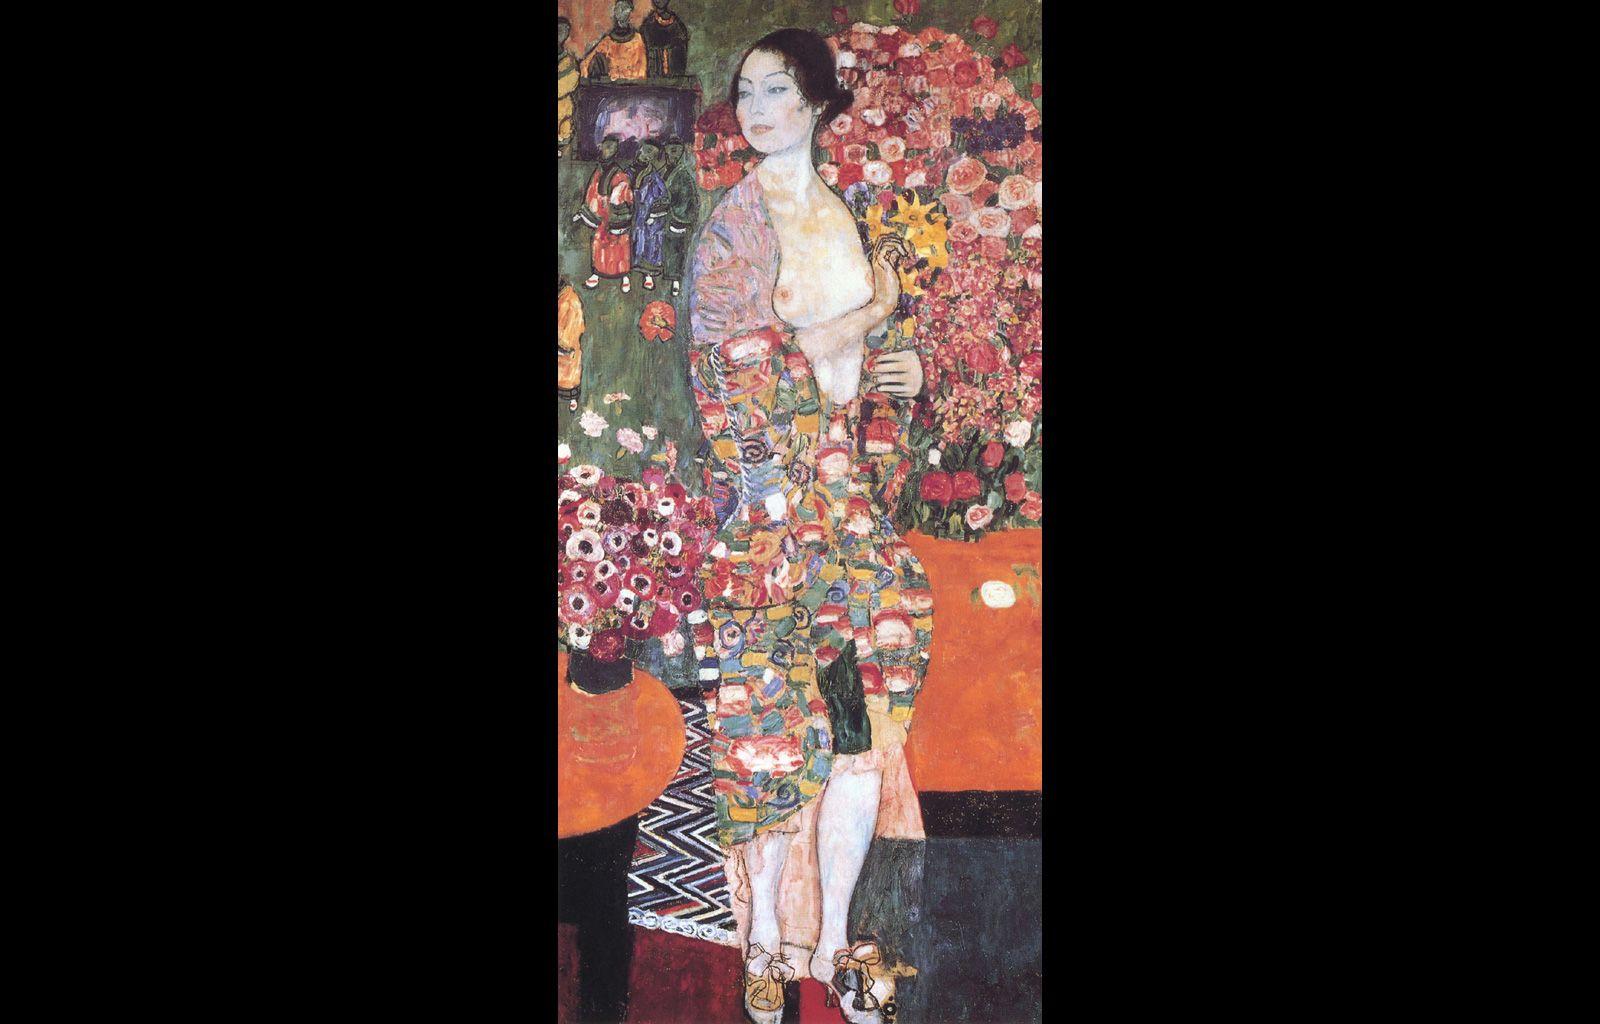 GUSTAV KLIMT The Dancer Large Framed Canvas Wall Art